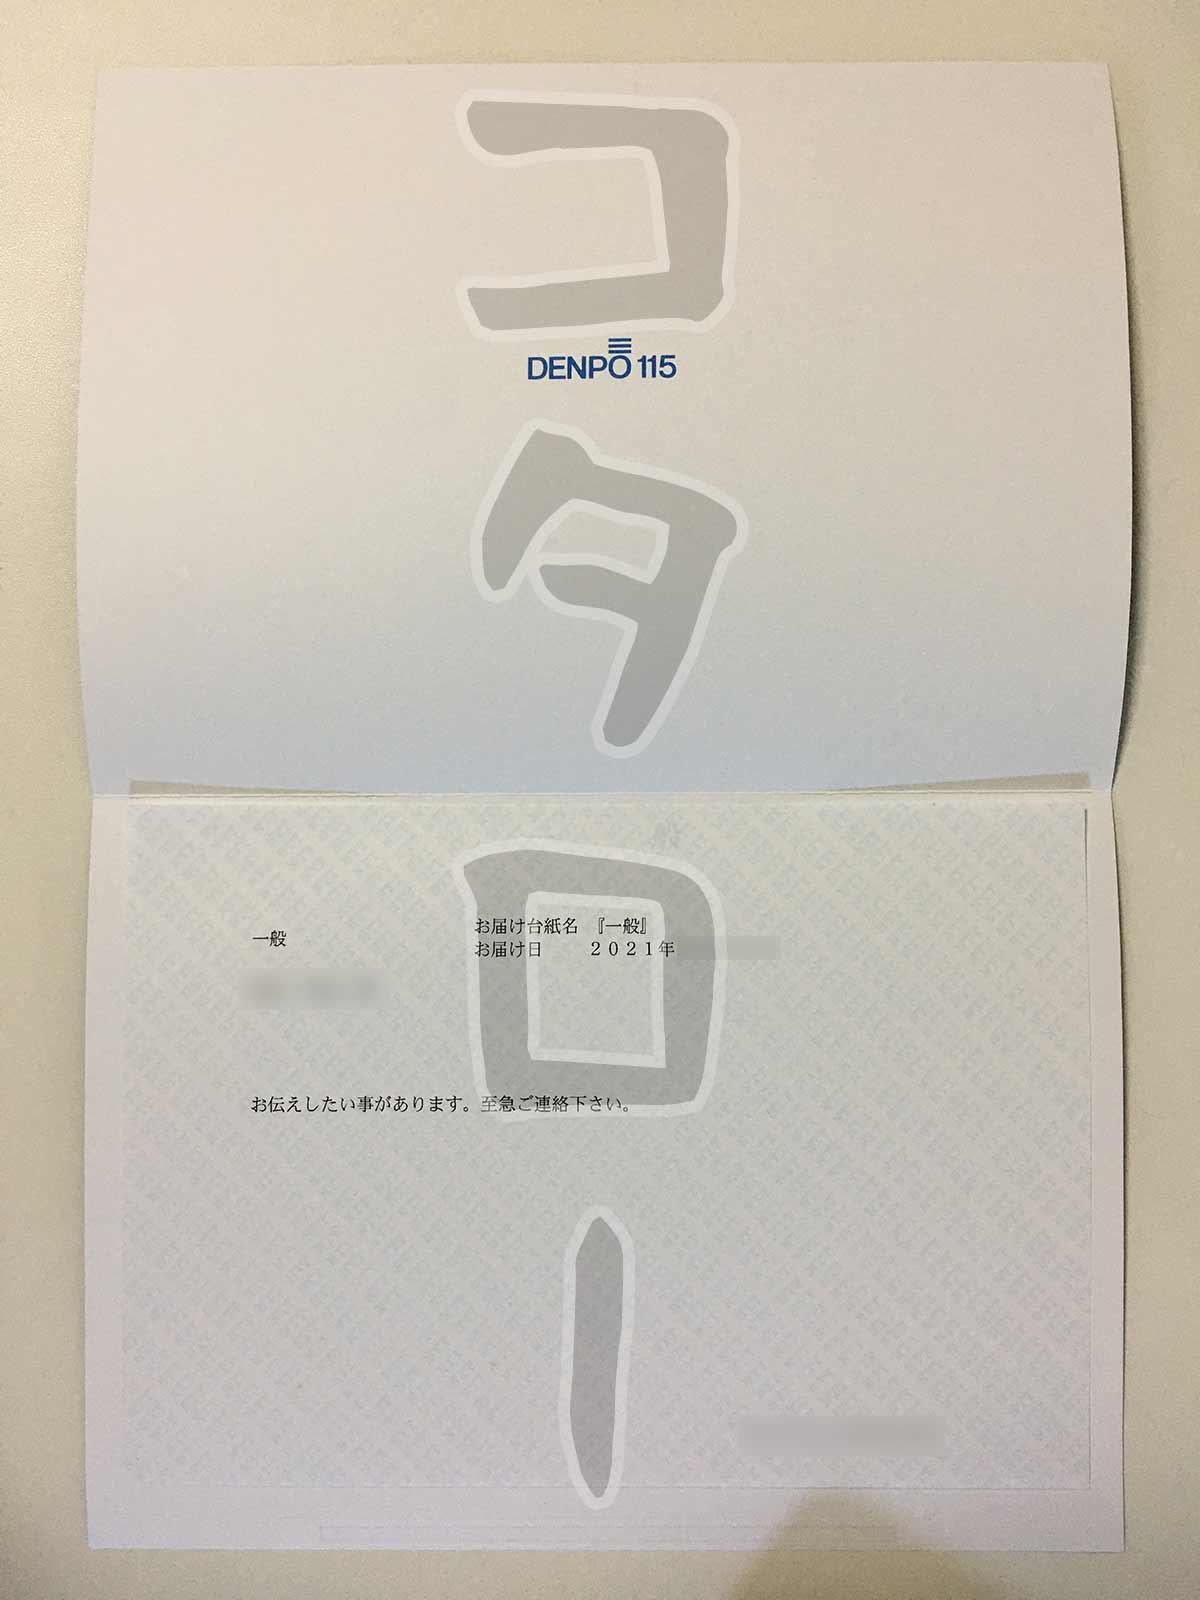 エーシーエス債権管理回収株式会社電報詳細2021年4月